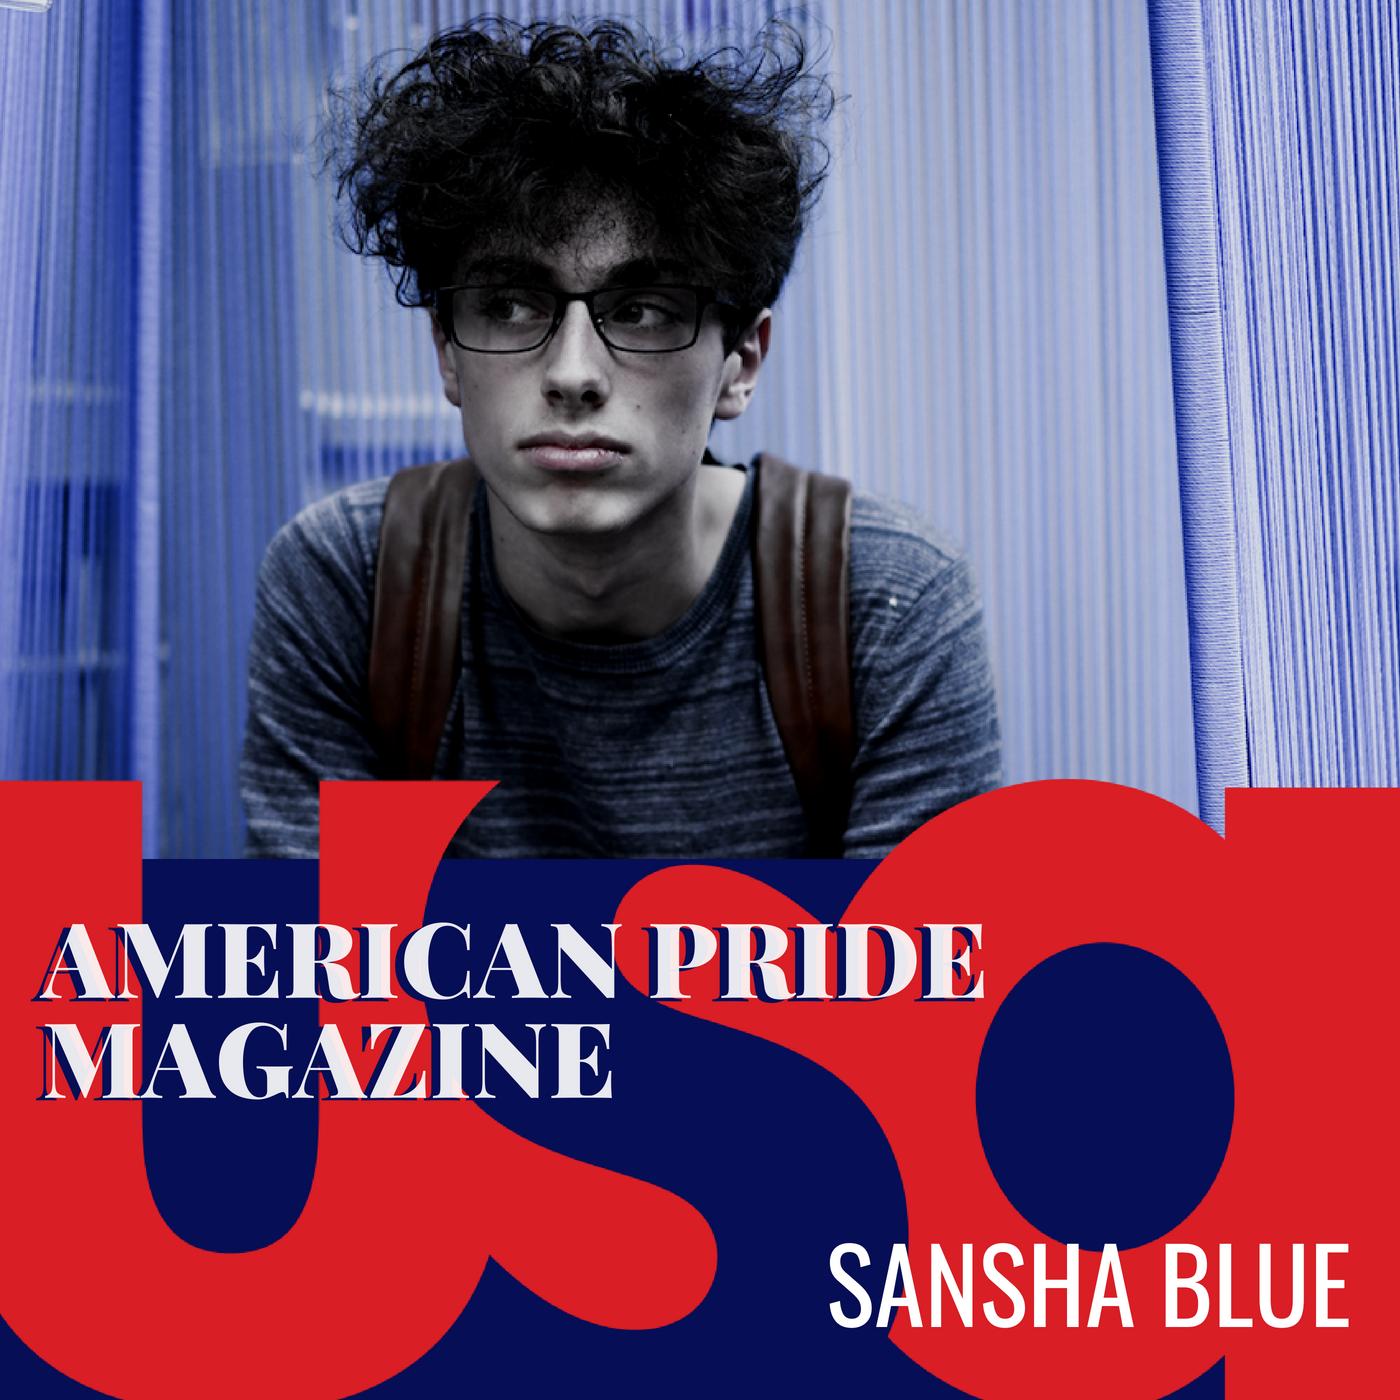 Sansha blue AMERIAN PRIDE - MAGAZINE.png